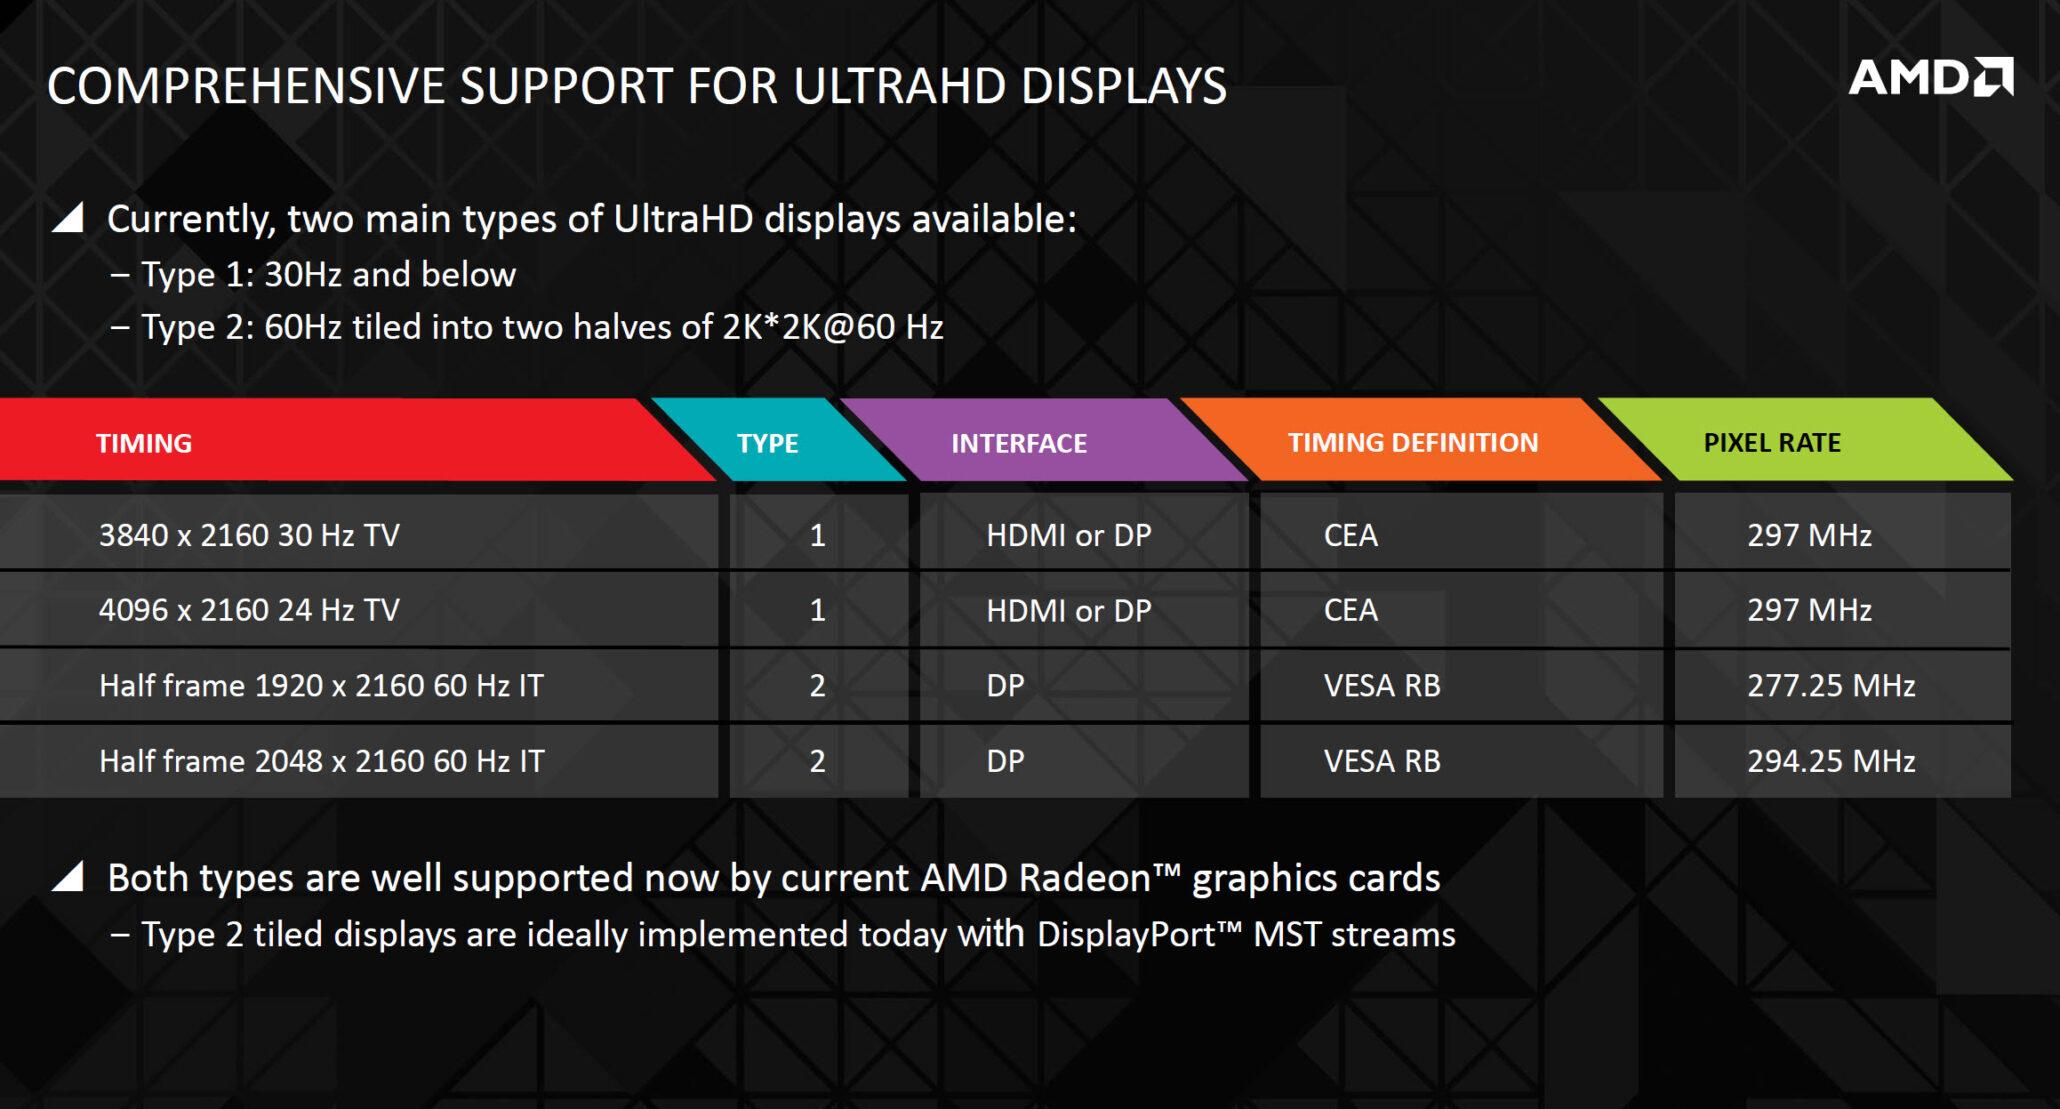 amd-ultrahd-display-support